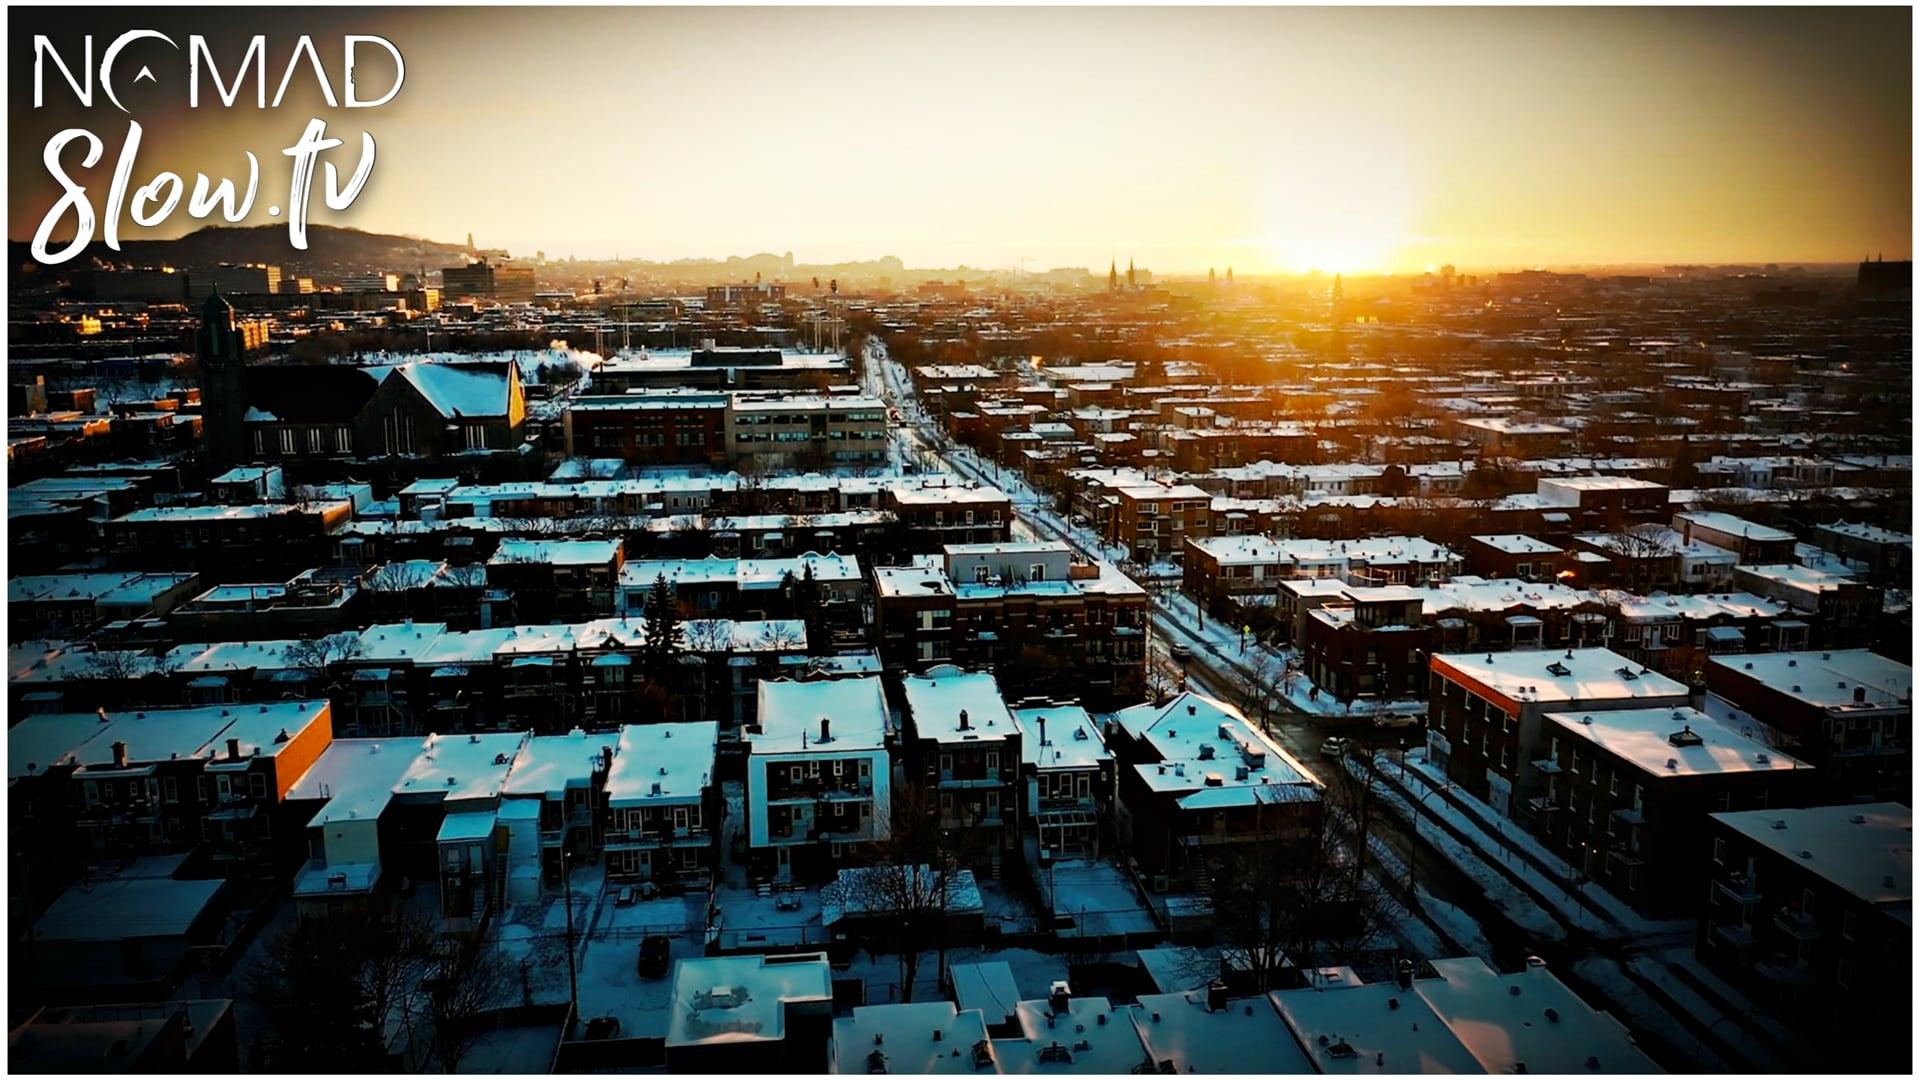 Montreal Winter Down Drone  Quiet Nights - Nate Blaze